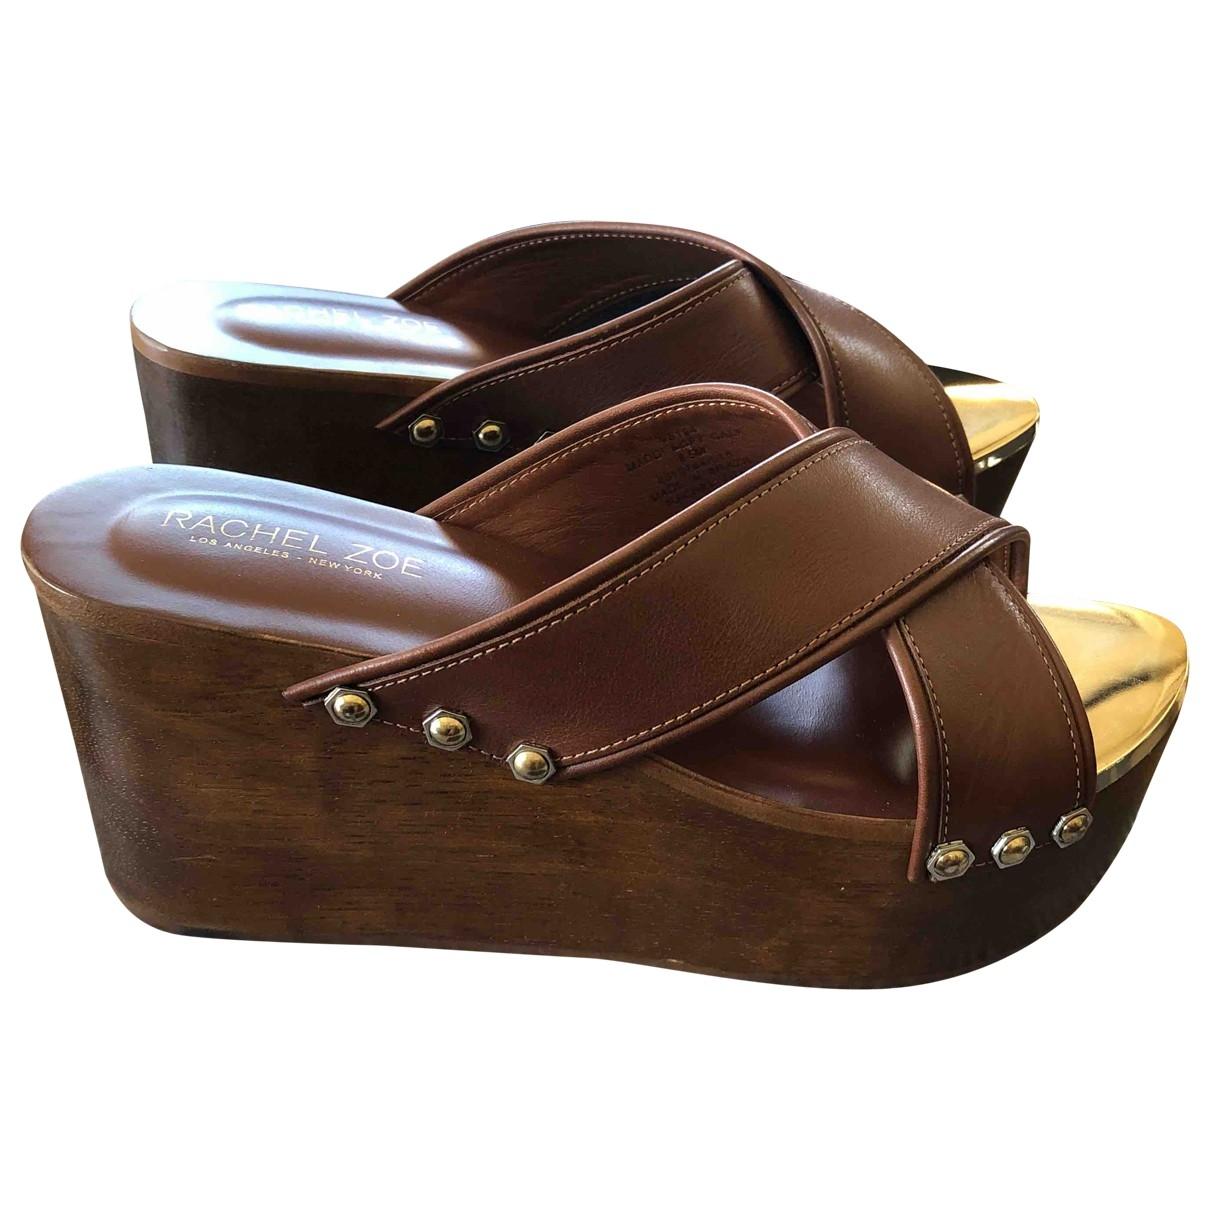 Rachel Zoe \N Brown Leather Sandals for Women 38.5 EU